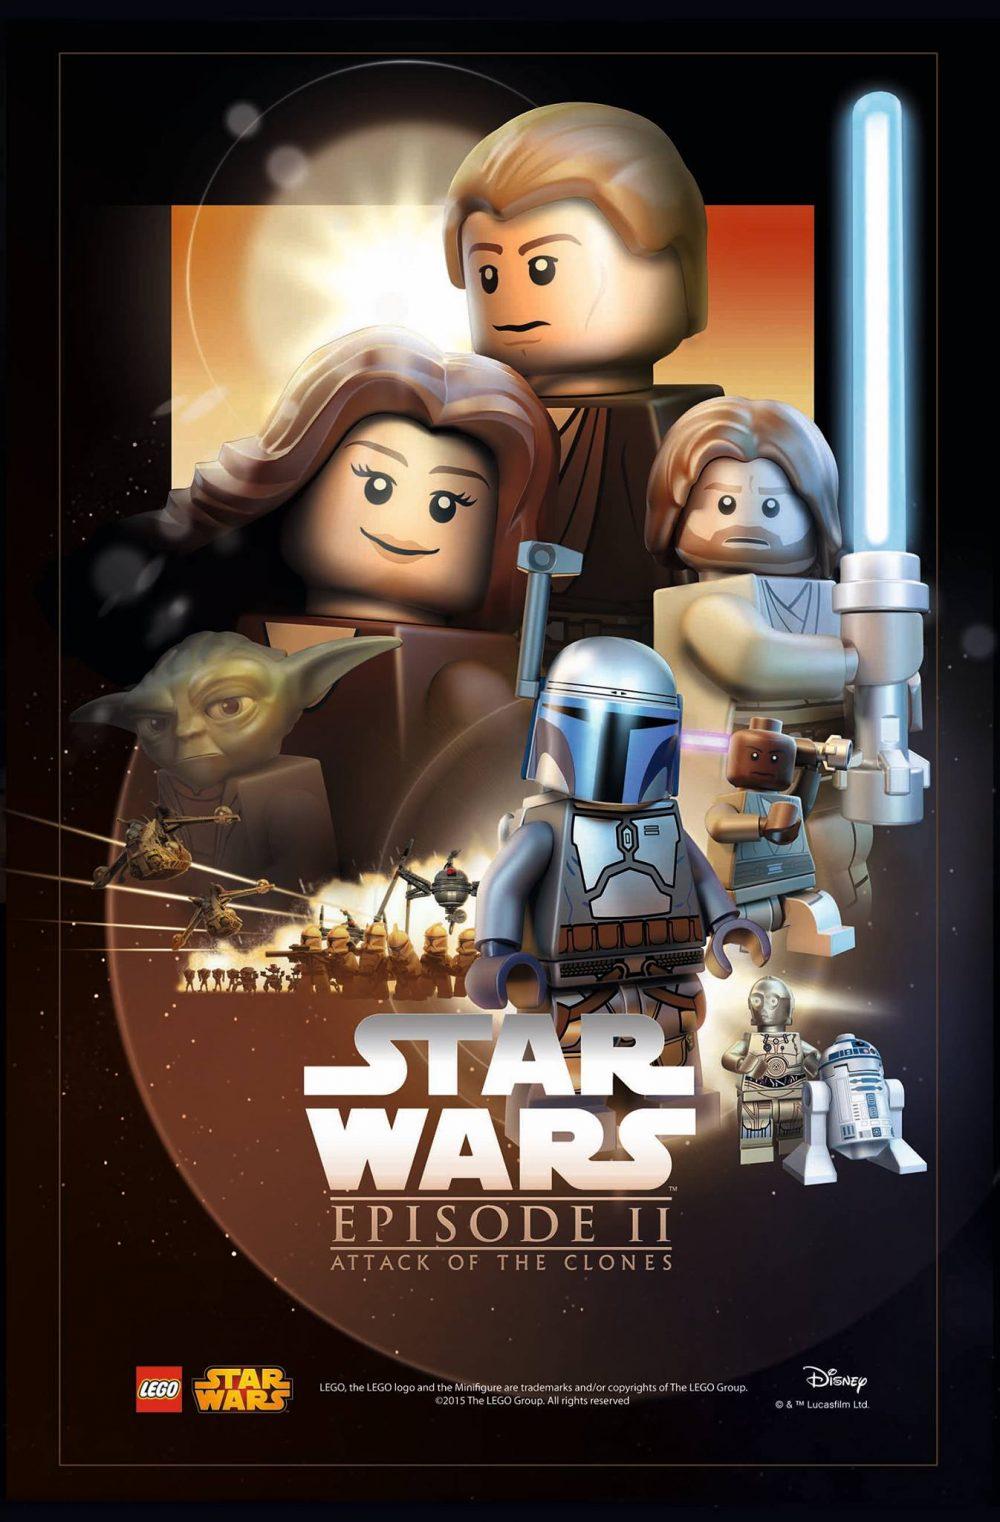 star wars lego poster episodio 2